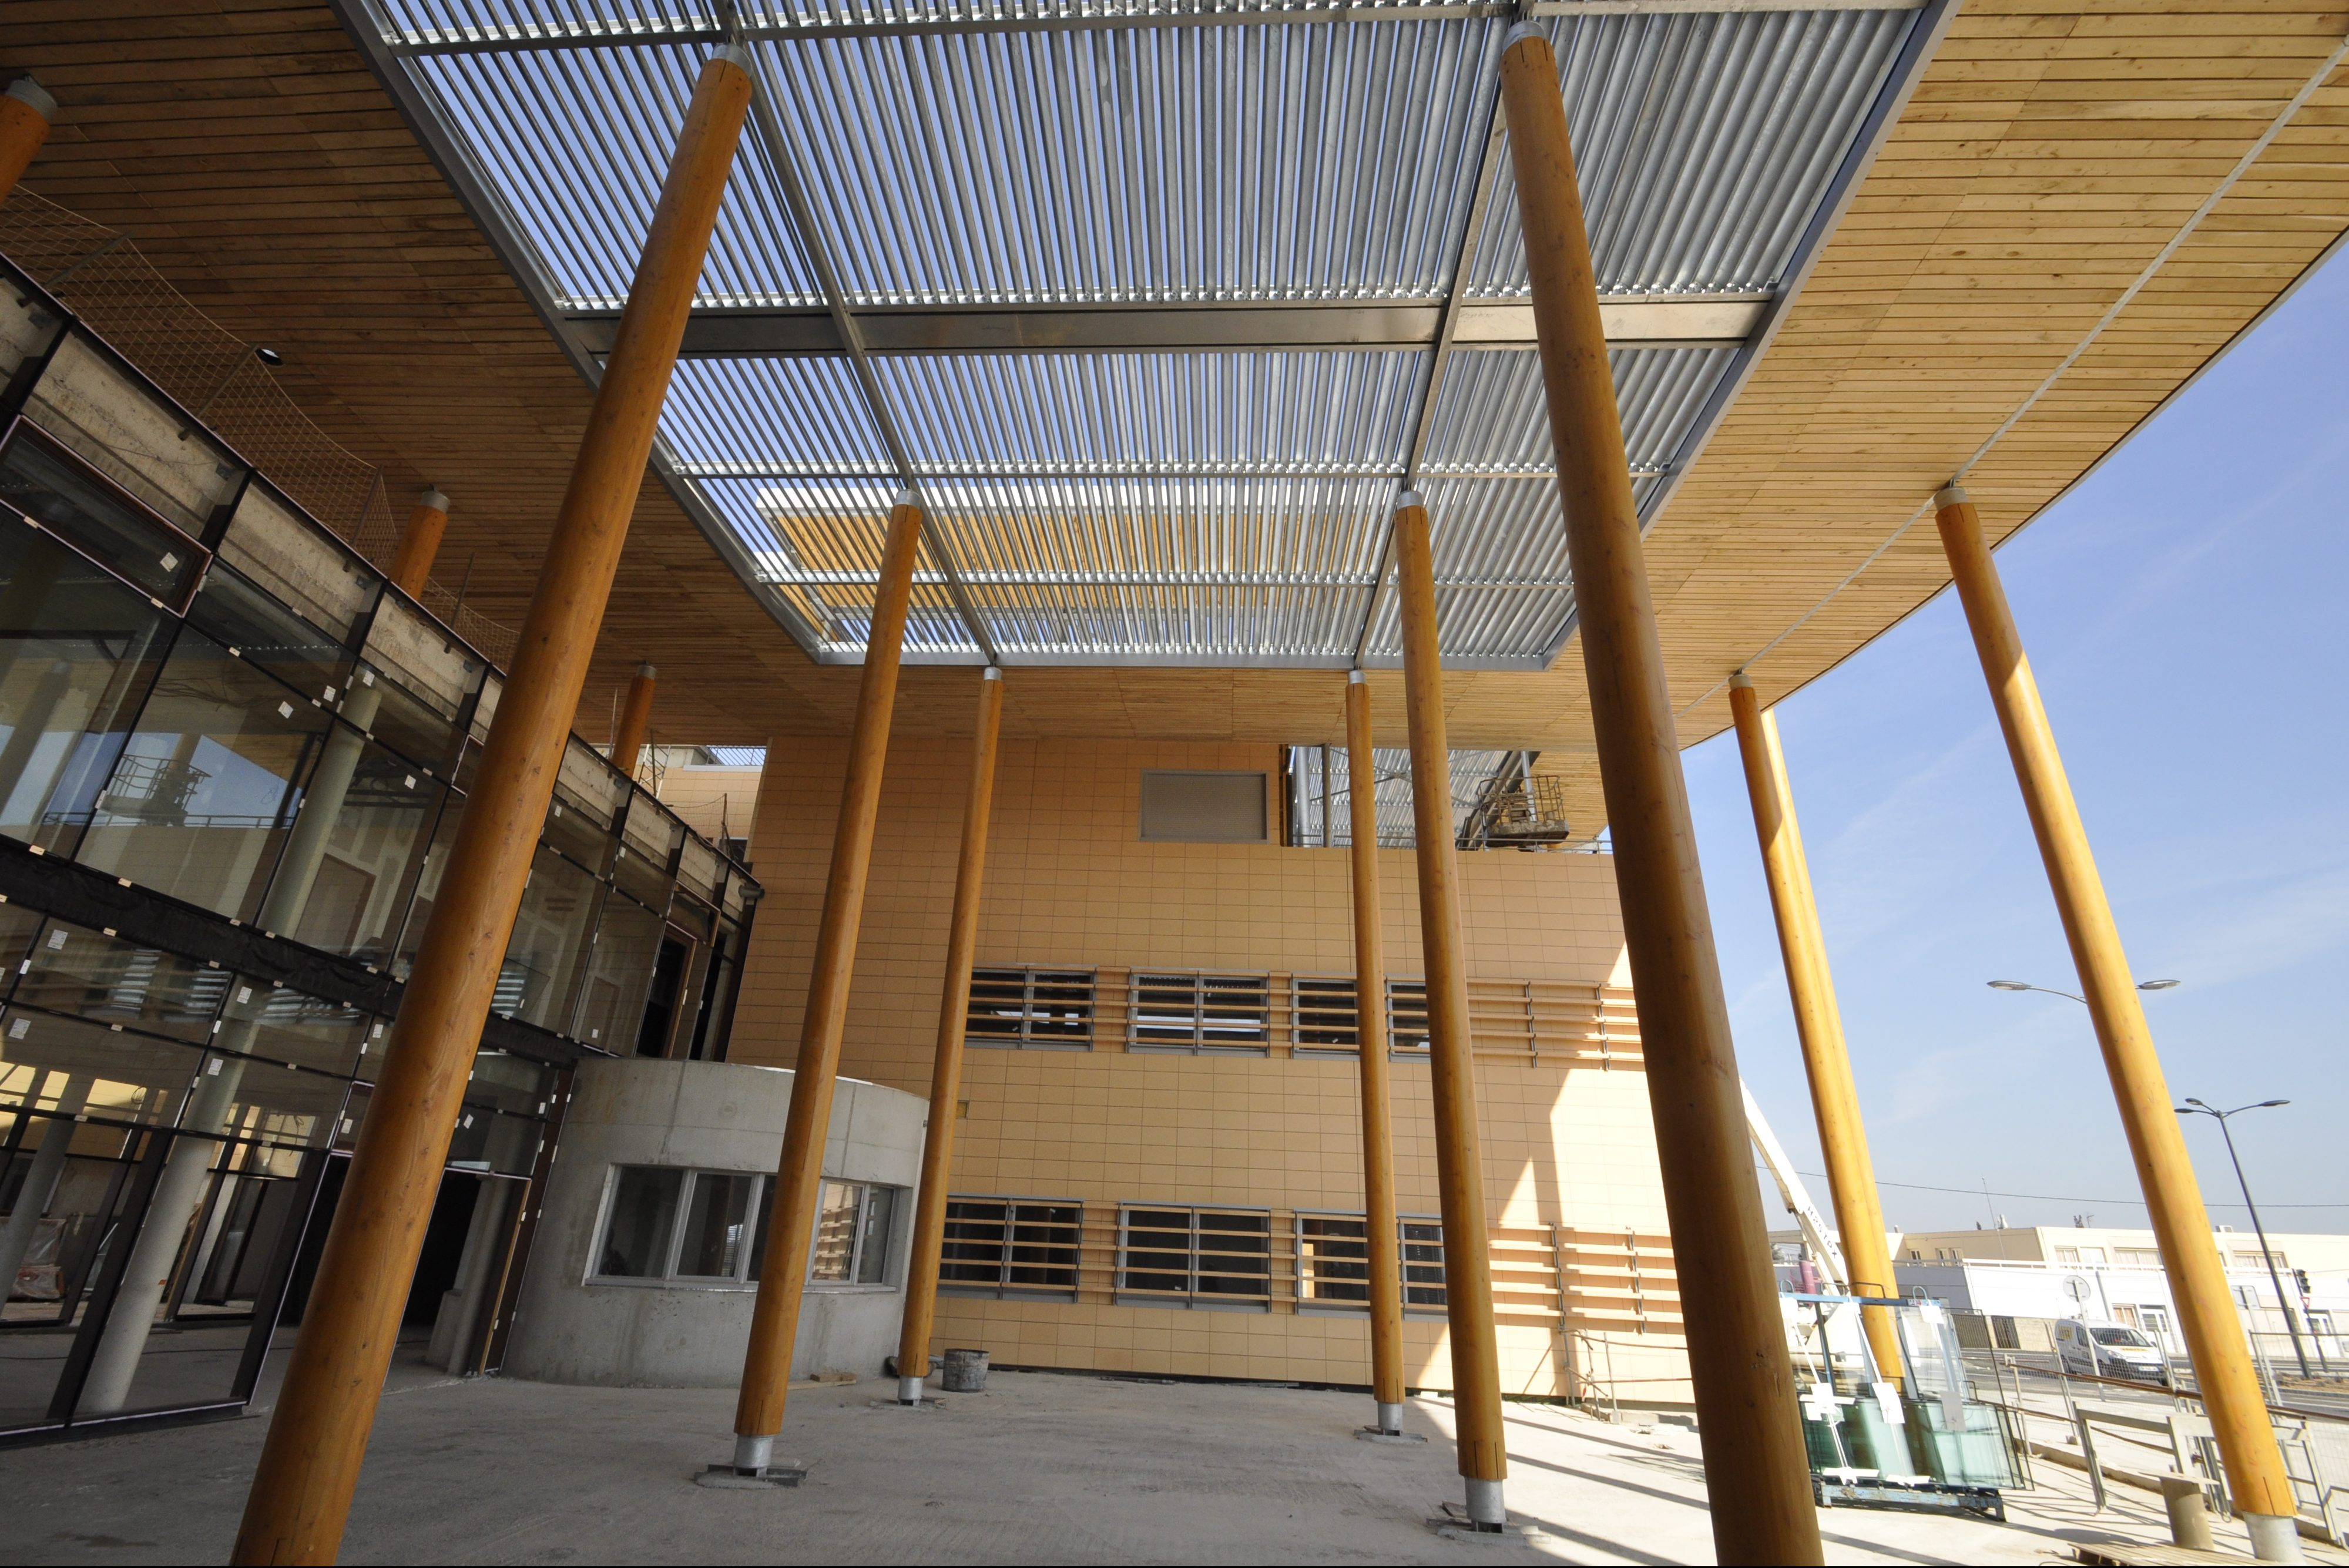 berre-letang_college_arbonis-construction-fargeot_2012-02-28-20